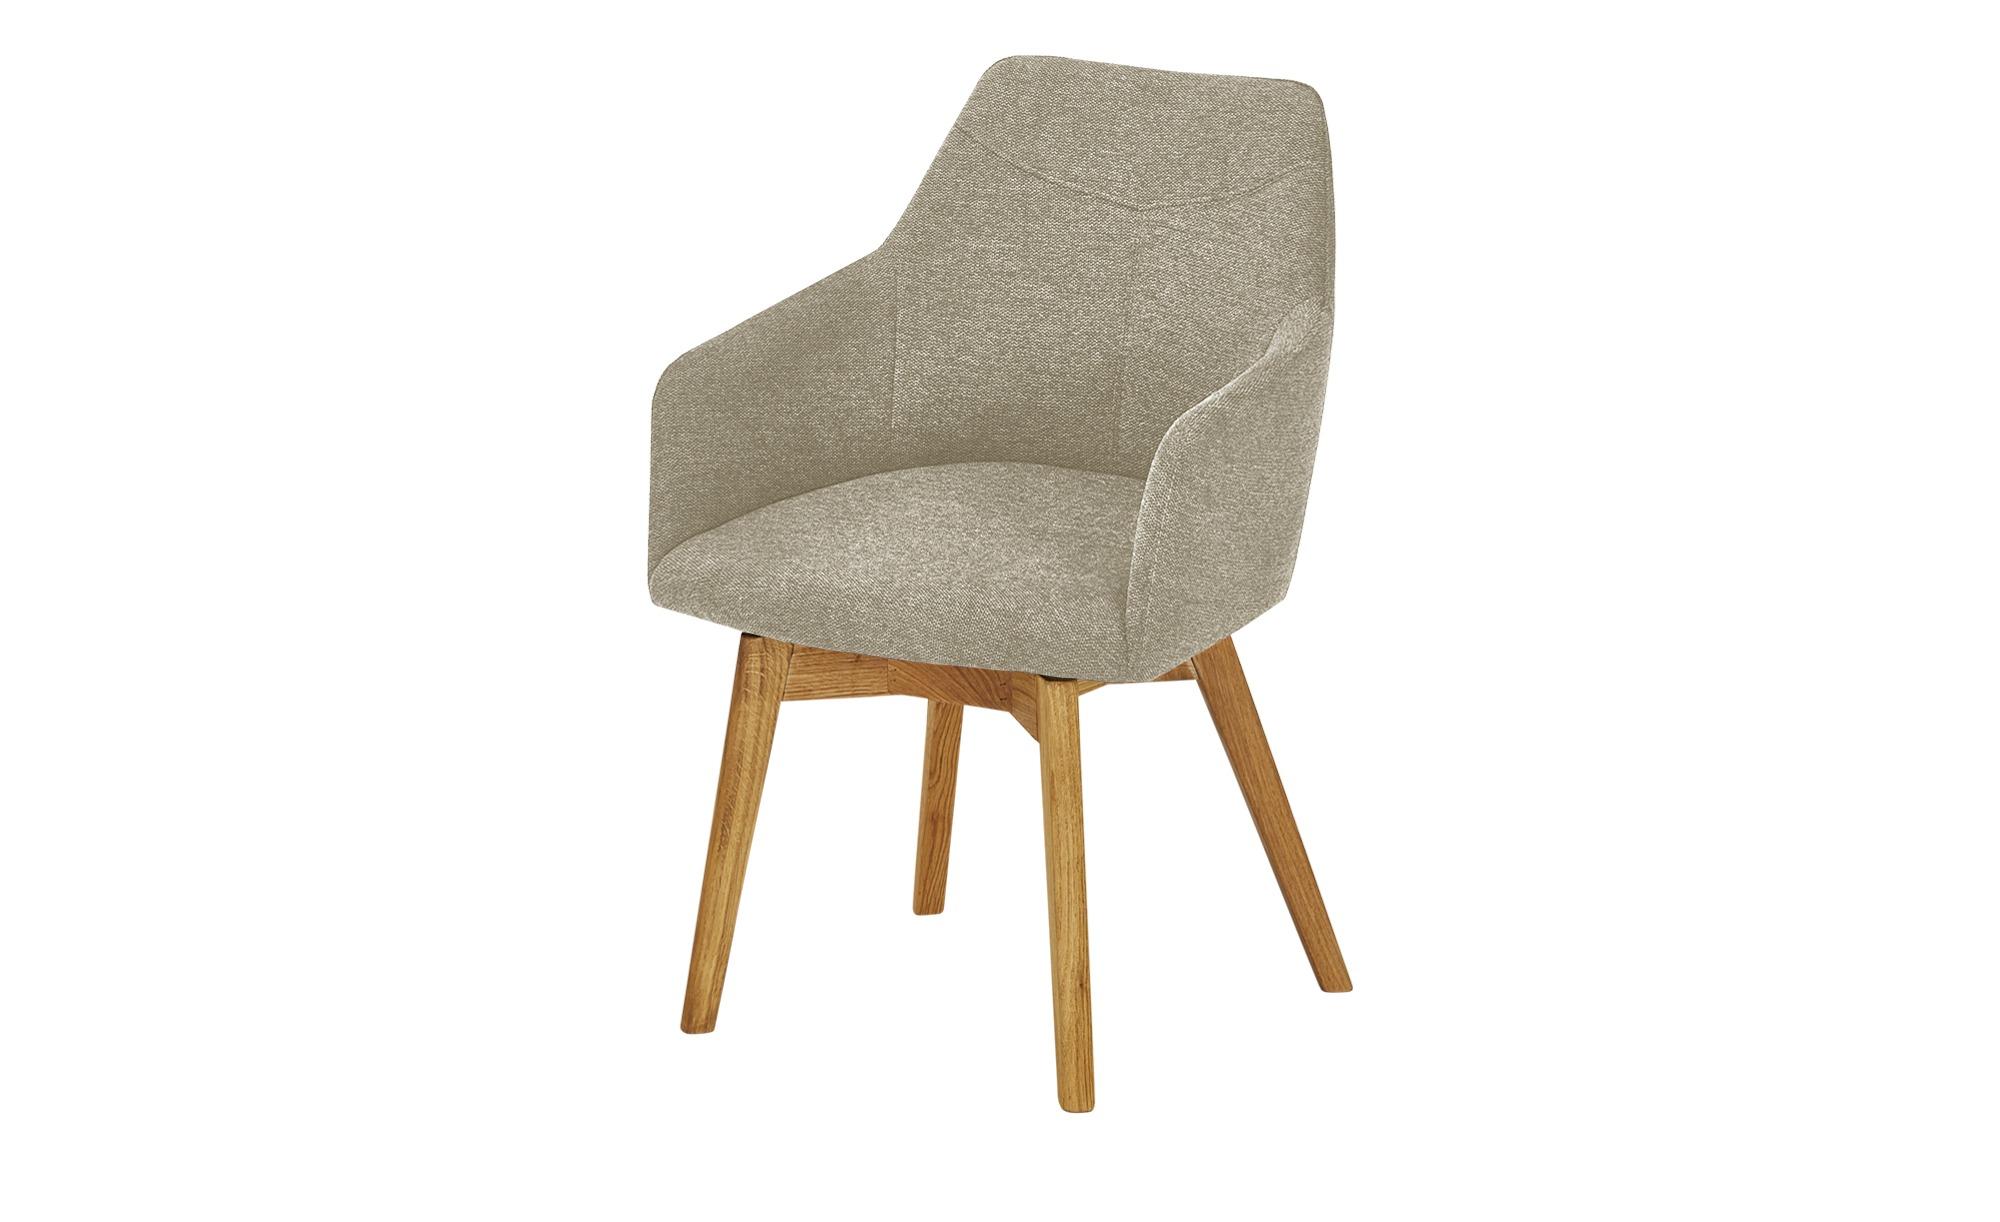 Woodford Sessel  Muron ¦ beige ¦ Maße (cm): B: 57 H: 84 T: 57 Stühle > Esszimmerstühle > Esszimmerstühle mit Armlehnen - Höffner